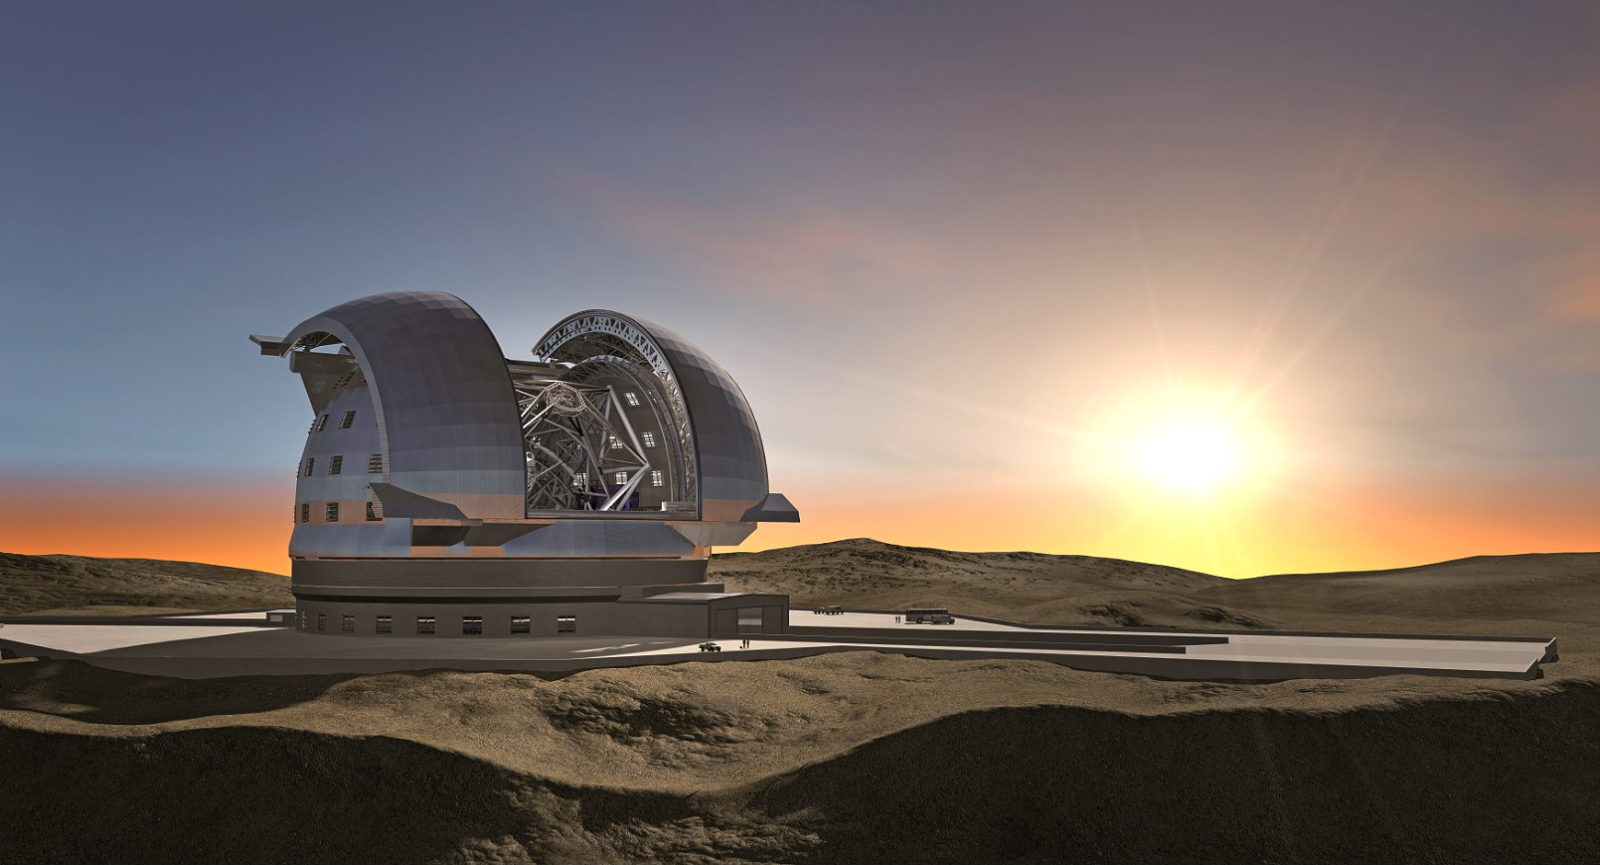 E-ELT_European_Extremely_Large_Telescope_Dome_Astronomy_Chile_IDOM_ADA_5_